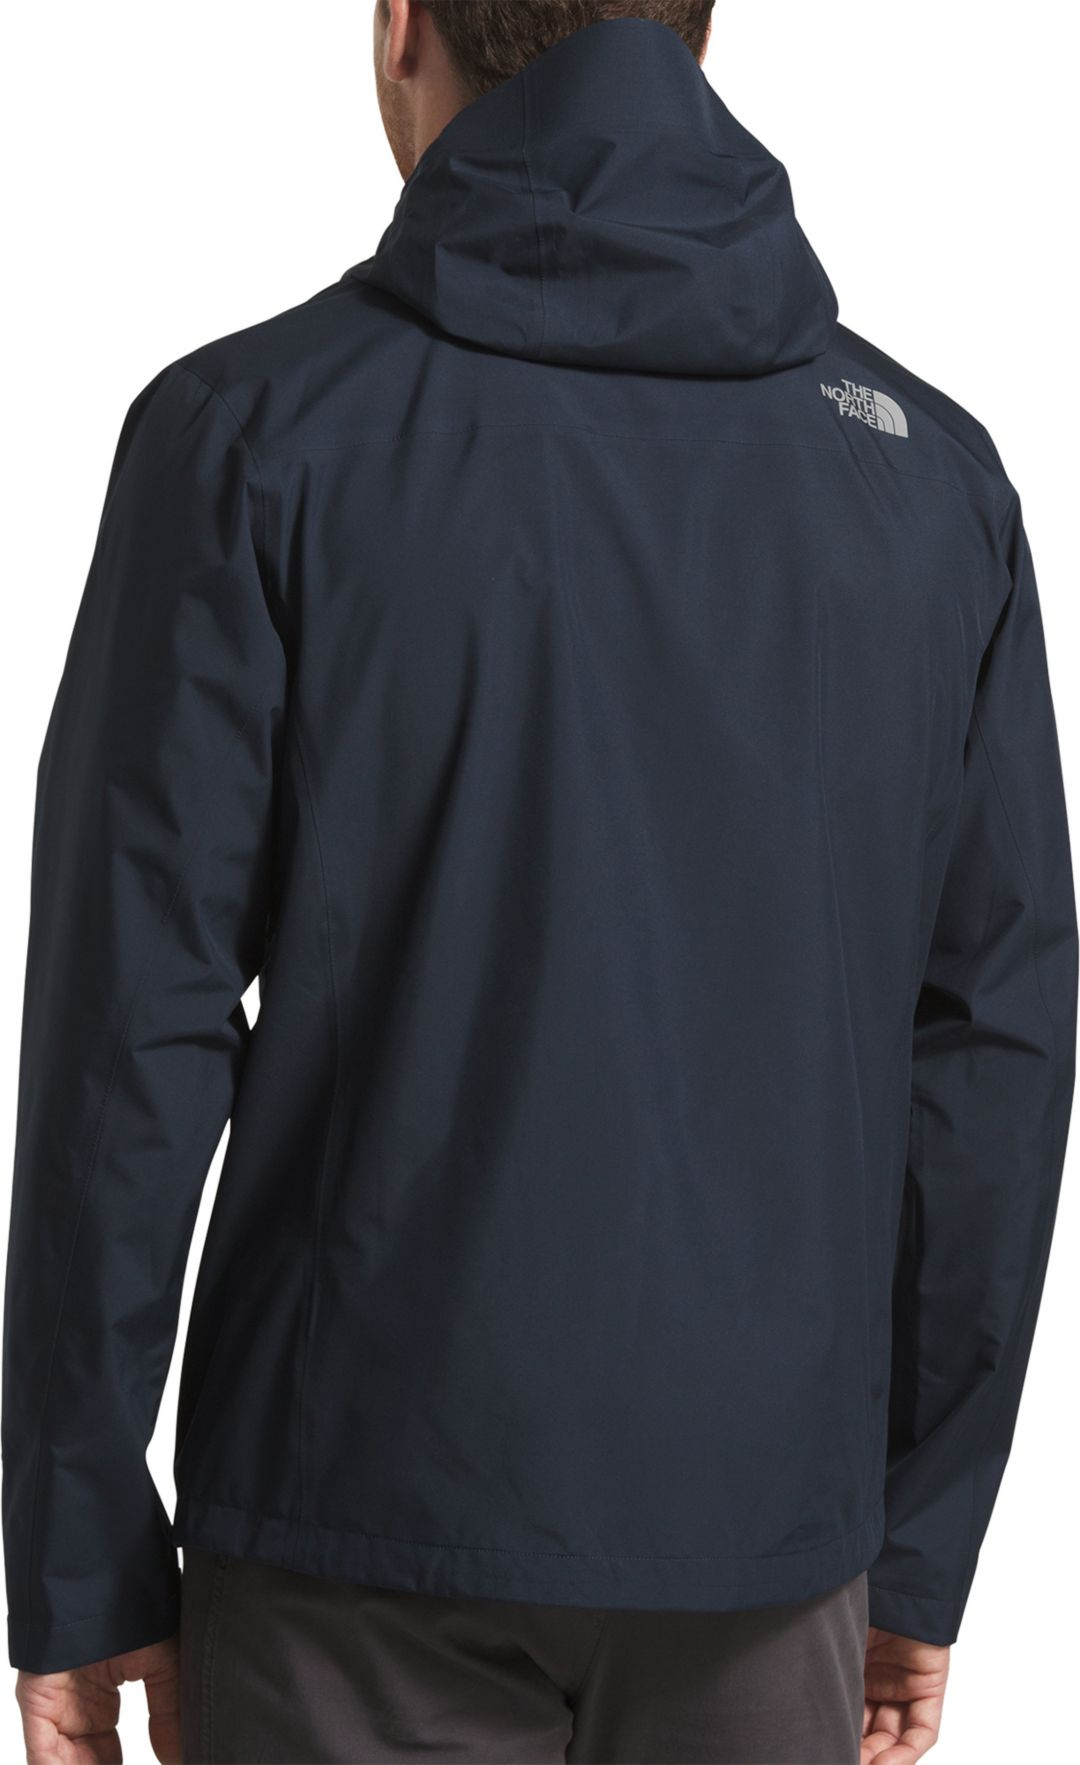 04cbad572 The North Face Men's Dryzzle Jacket